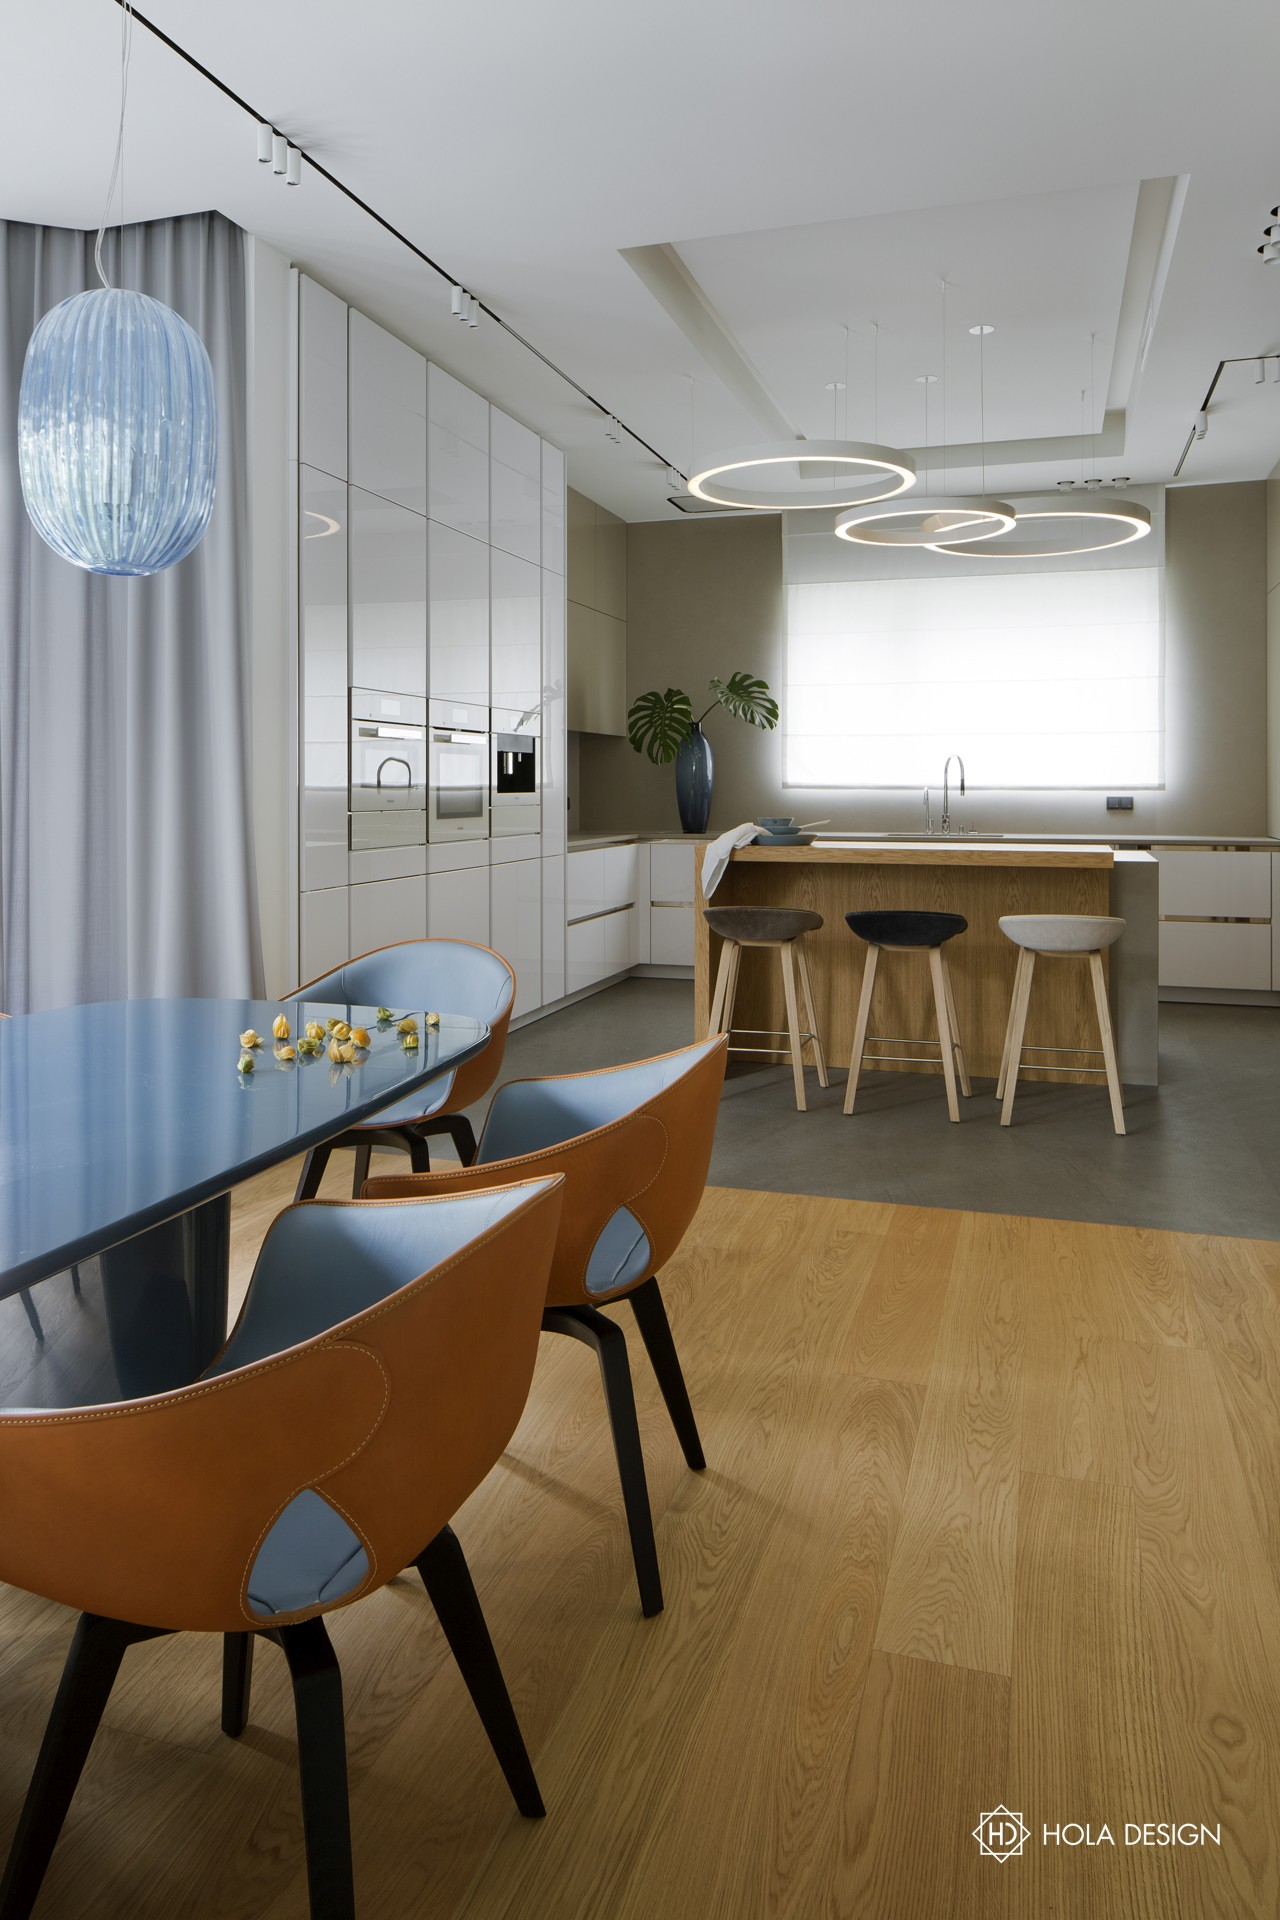 Kuchnia otwarta na salon i jadalnię, proj. Hola Design